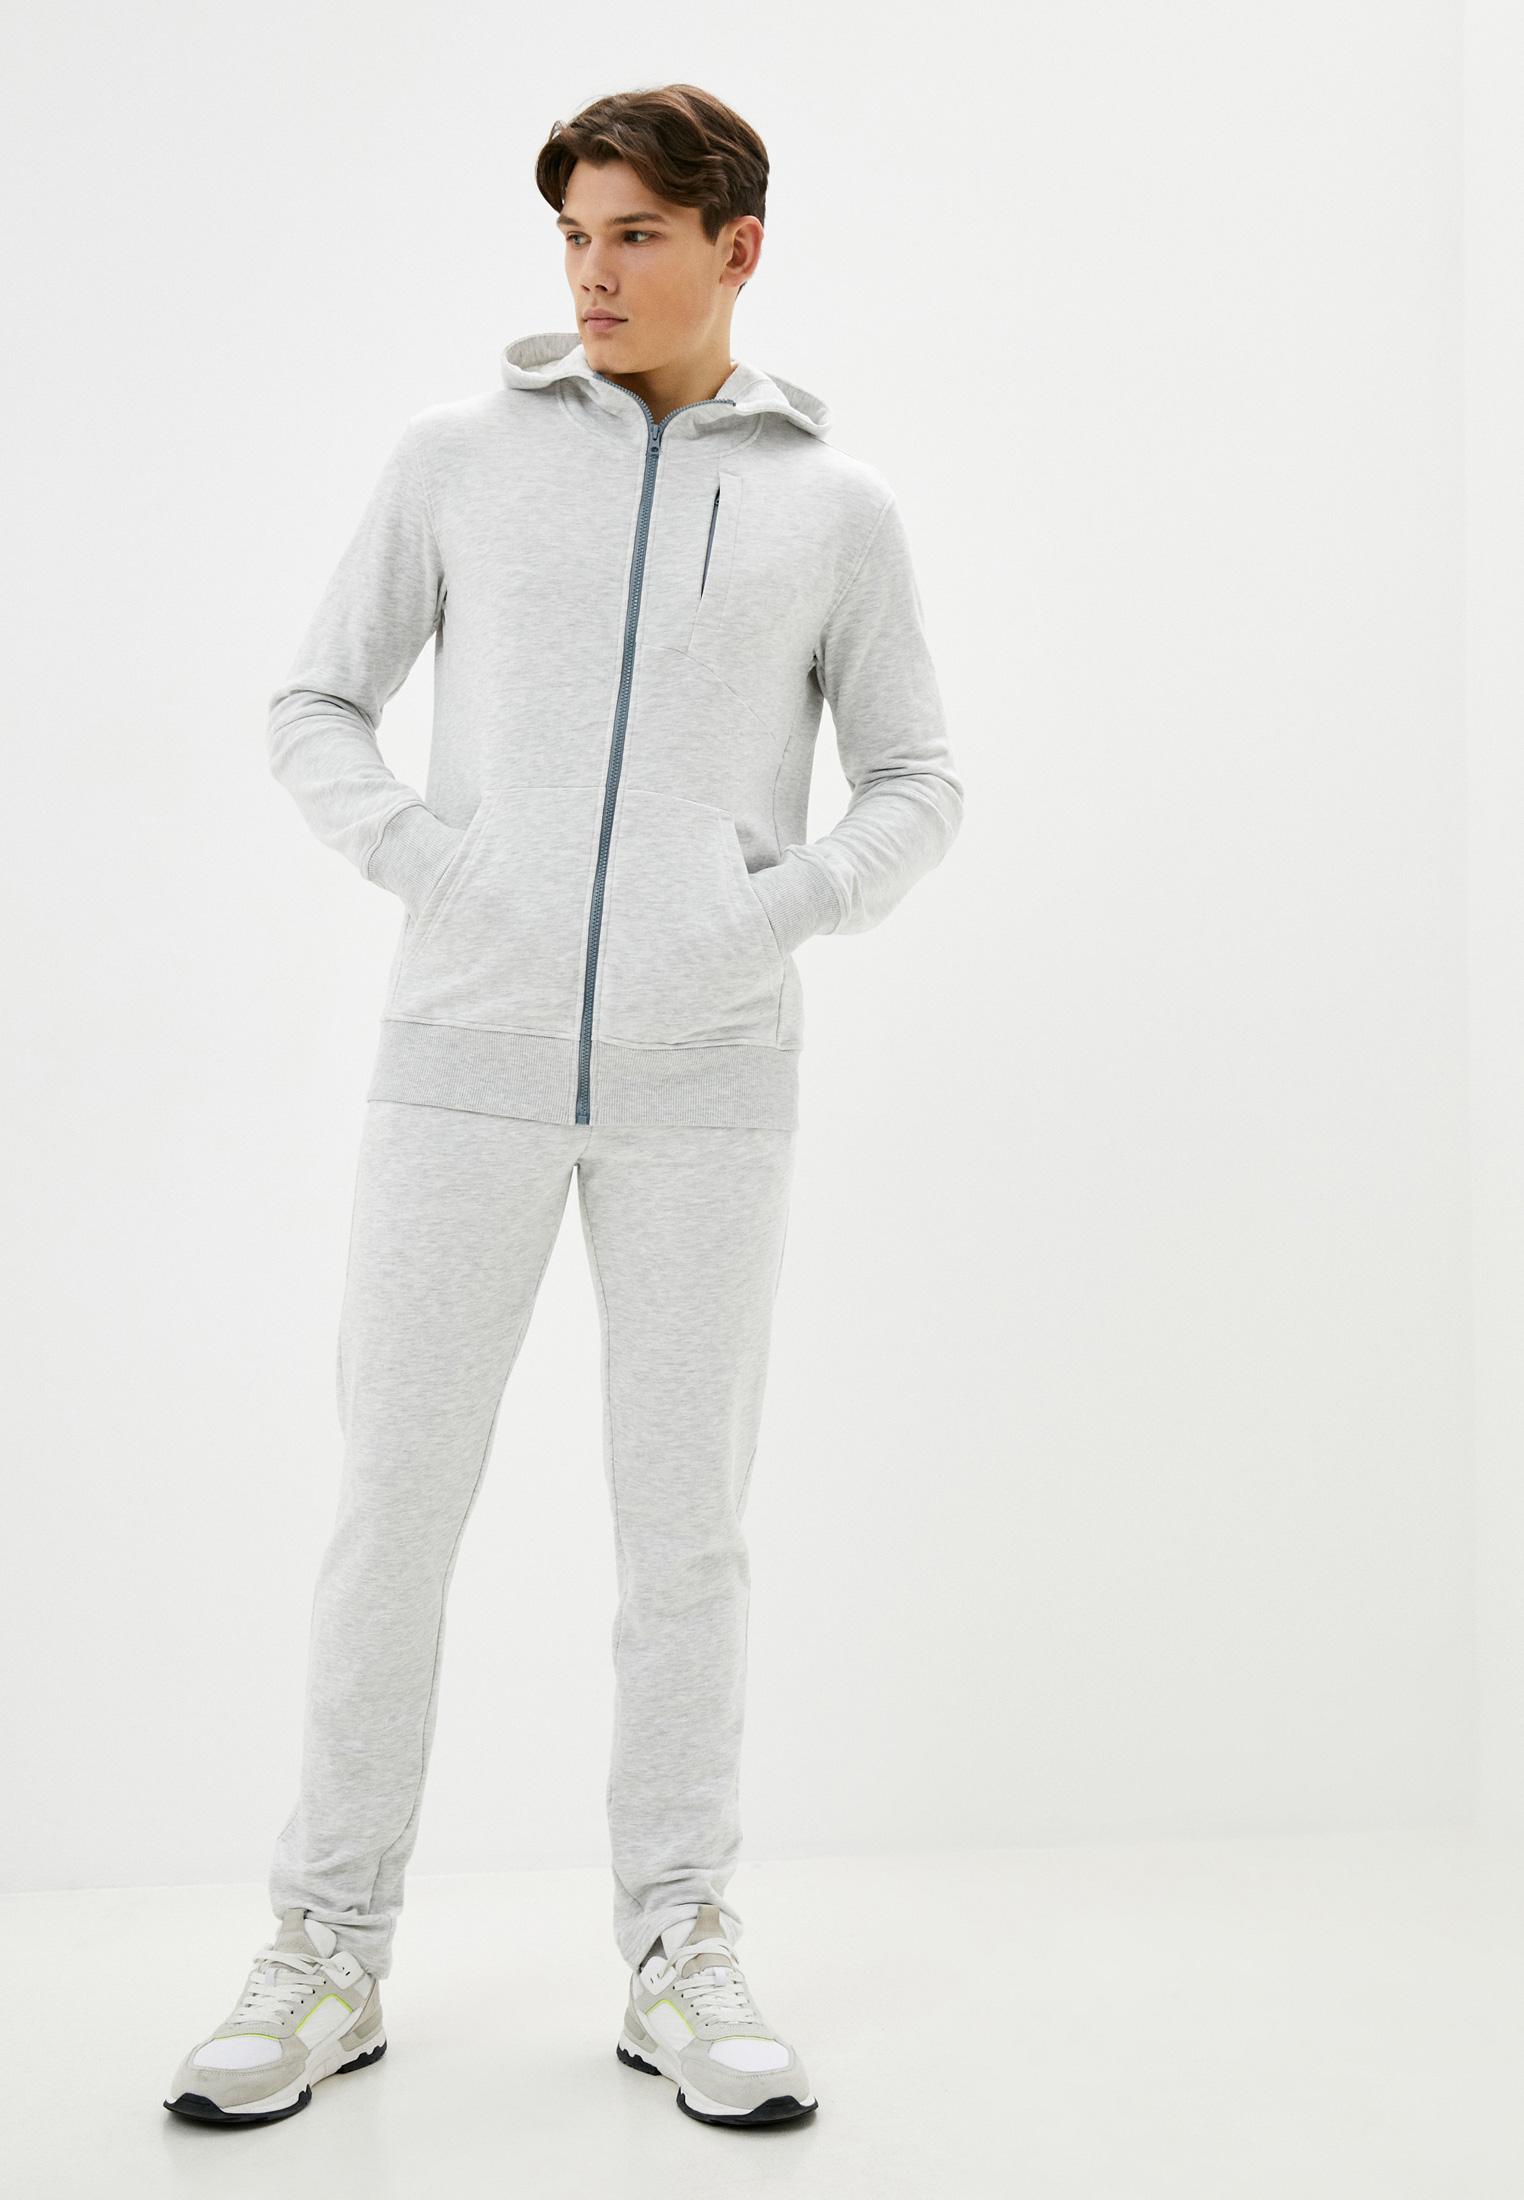 Спортивный костюм Sitlly 20816